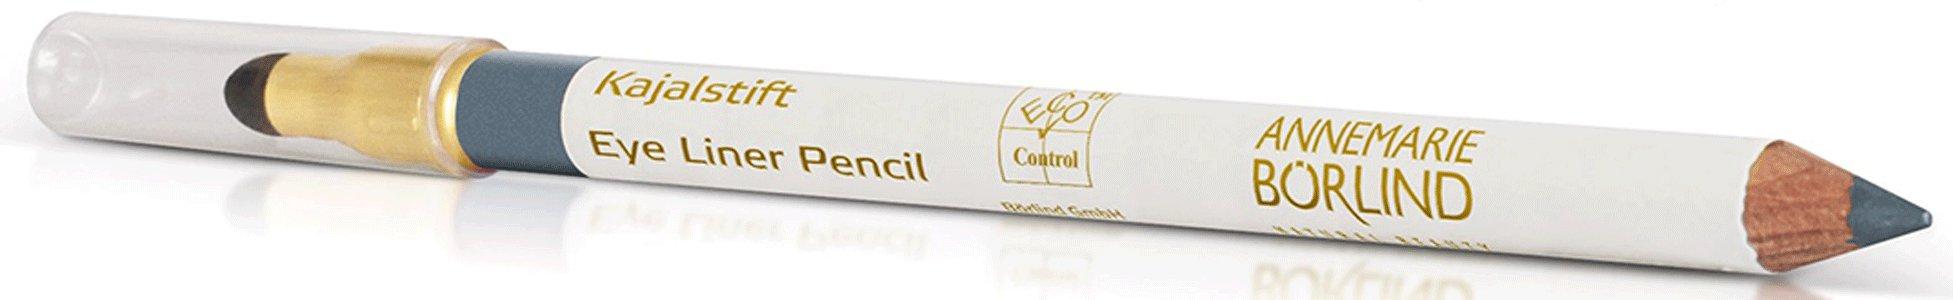 Buy Eye Liner Pencil Graphite